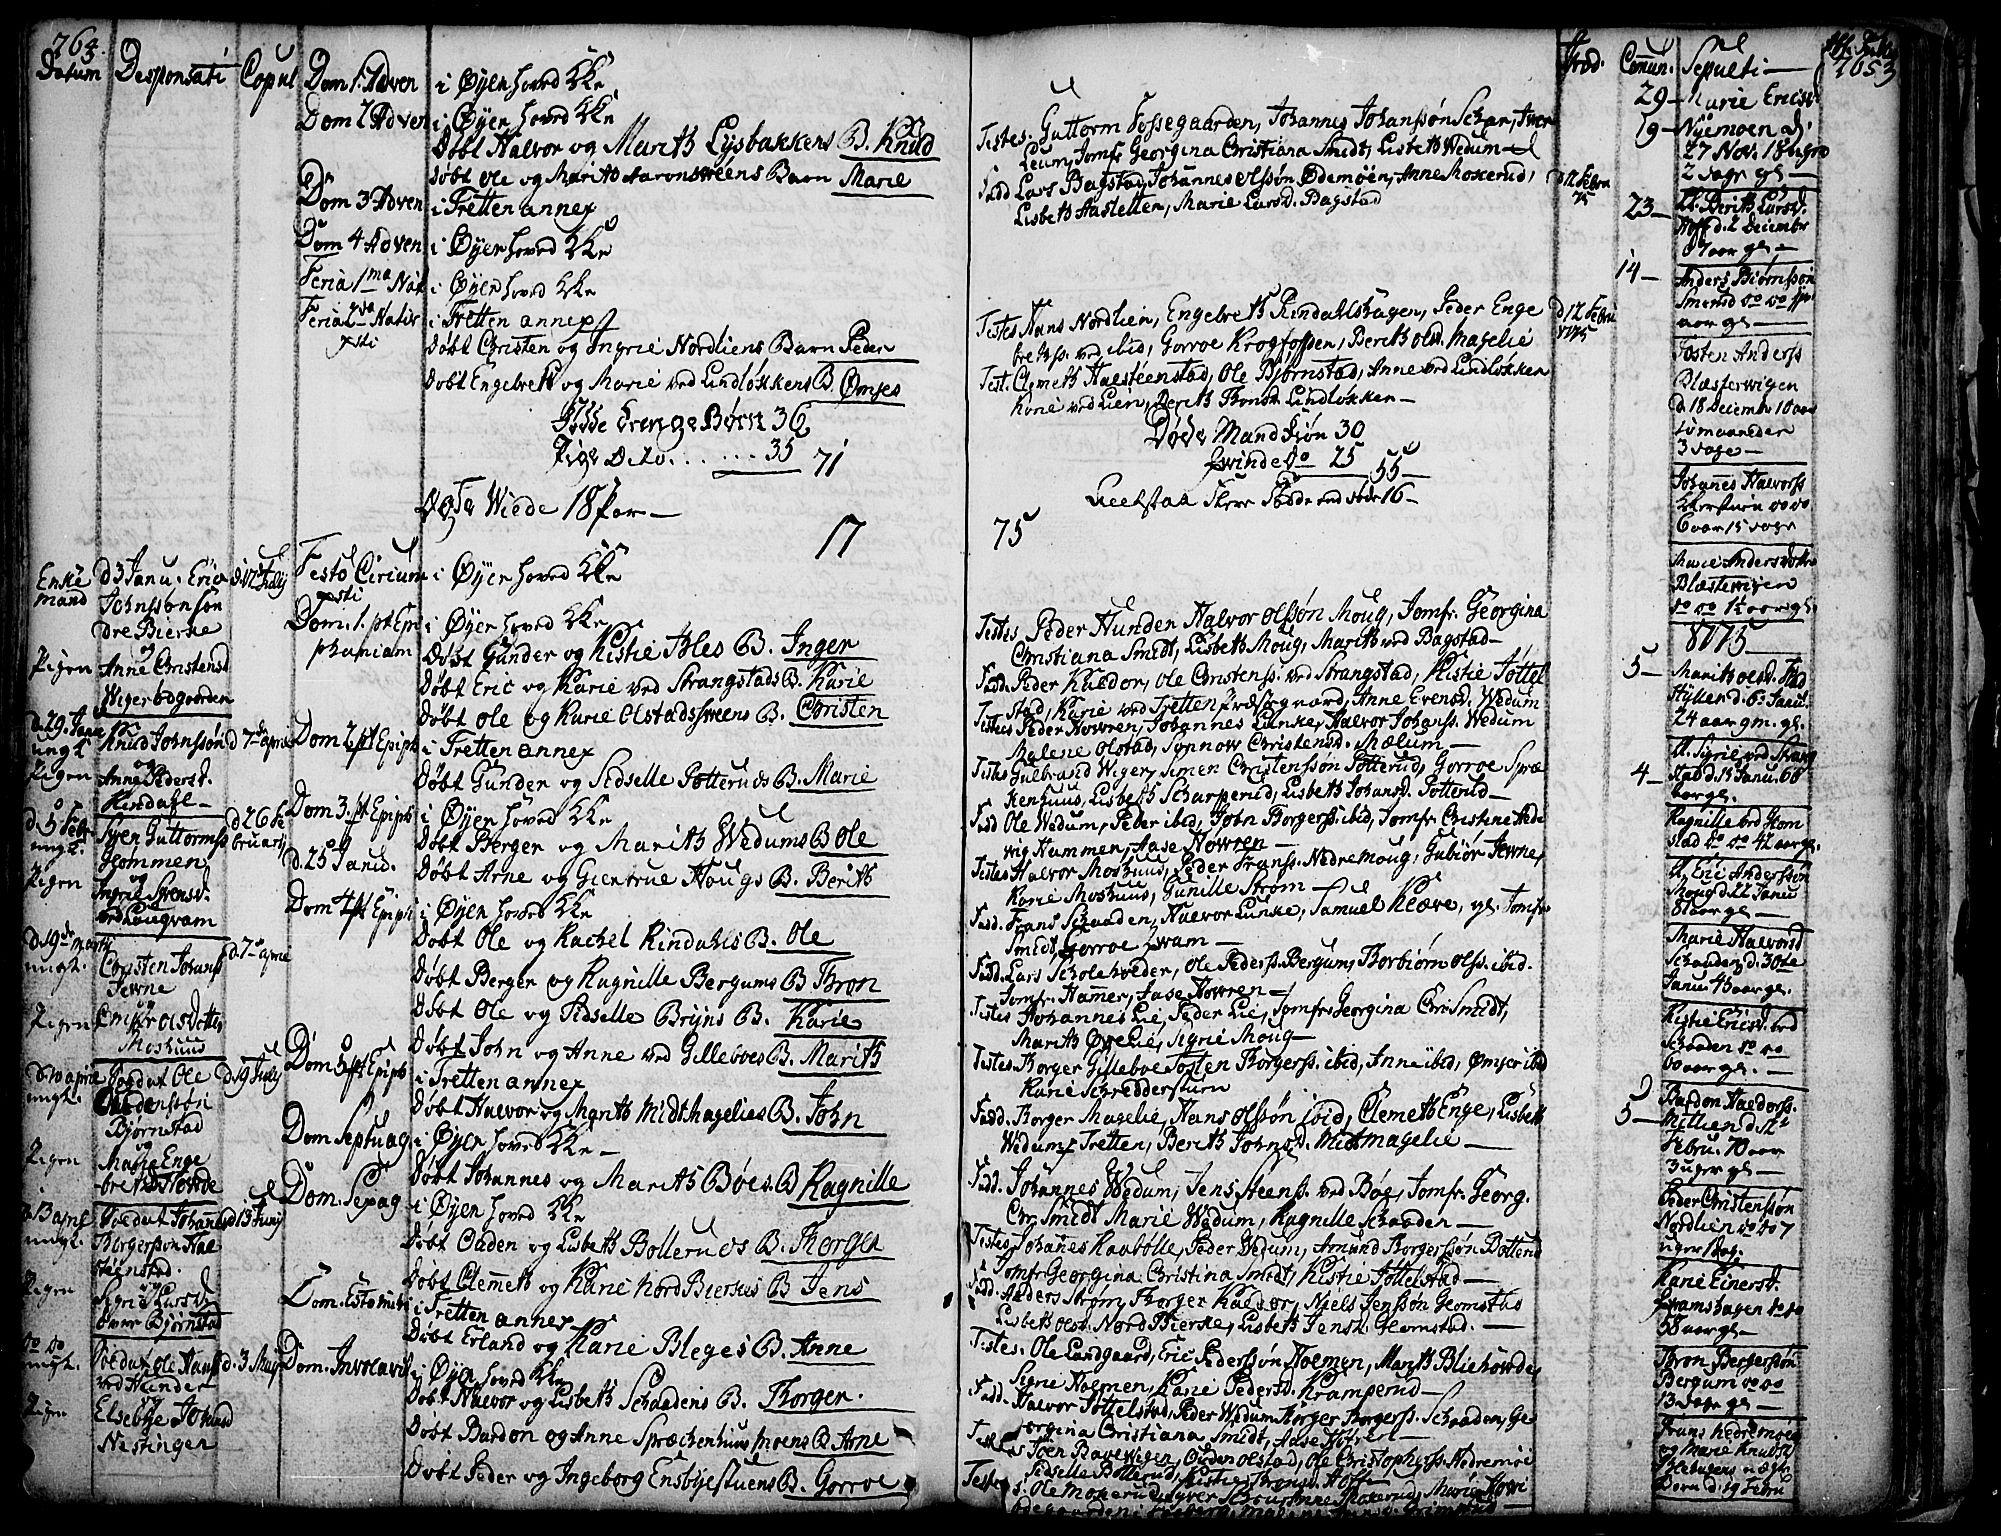 SAH, Øyer prestekontor, Ministerialbok nr. 2, 1733-1784, s. 264-265